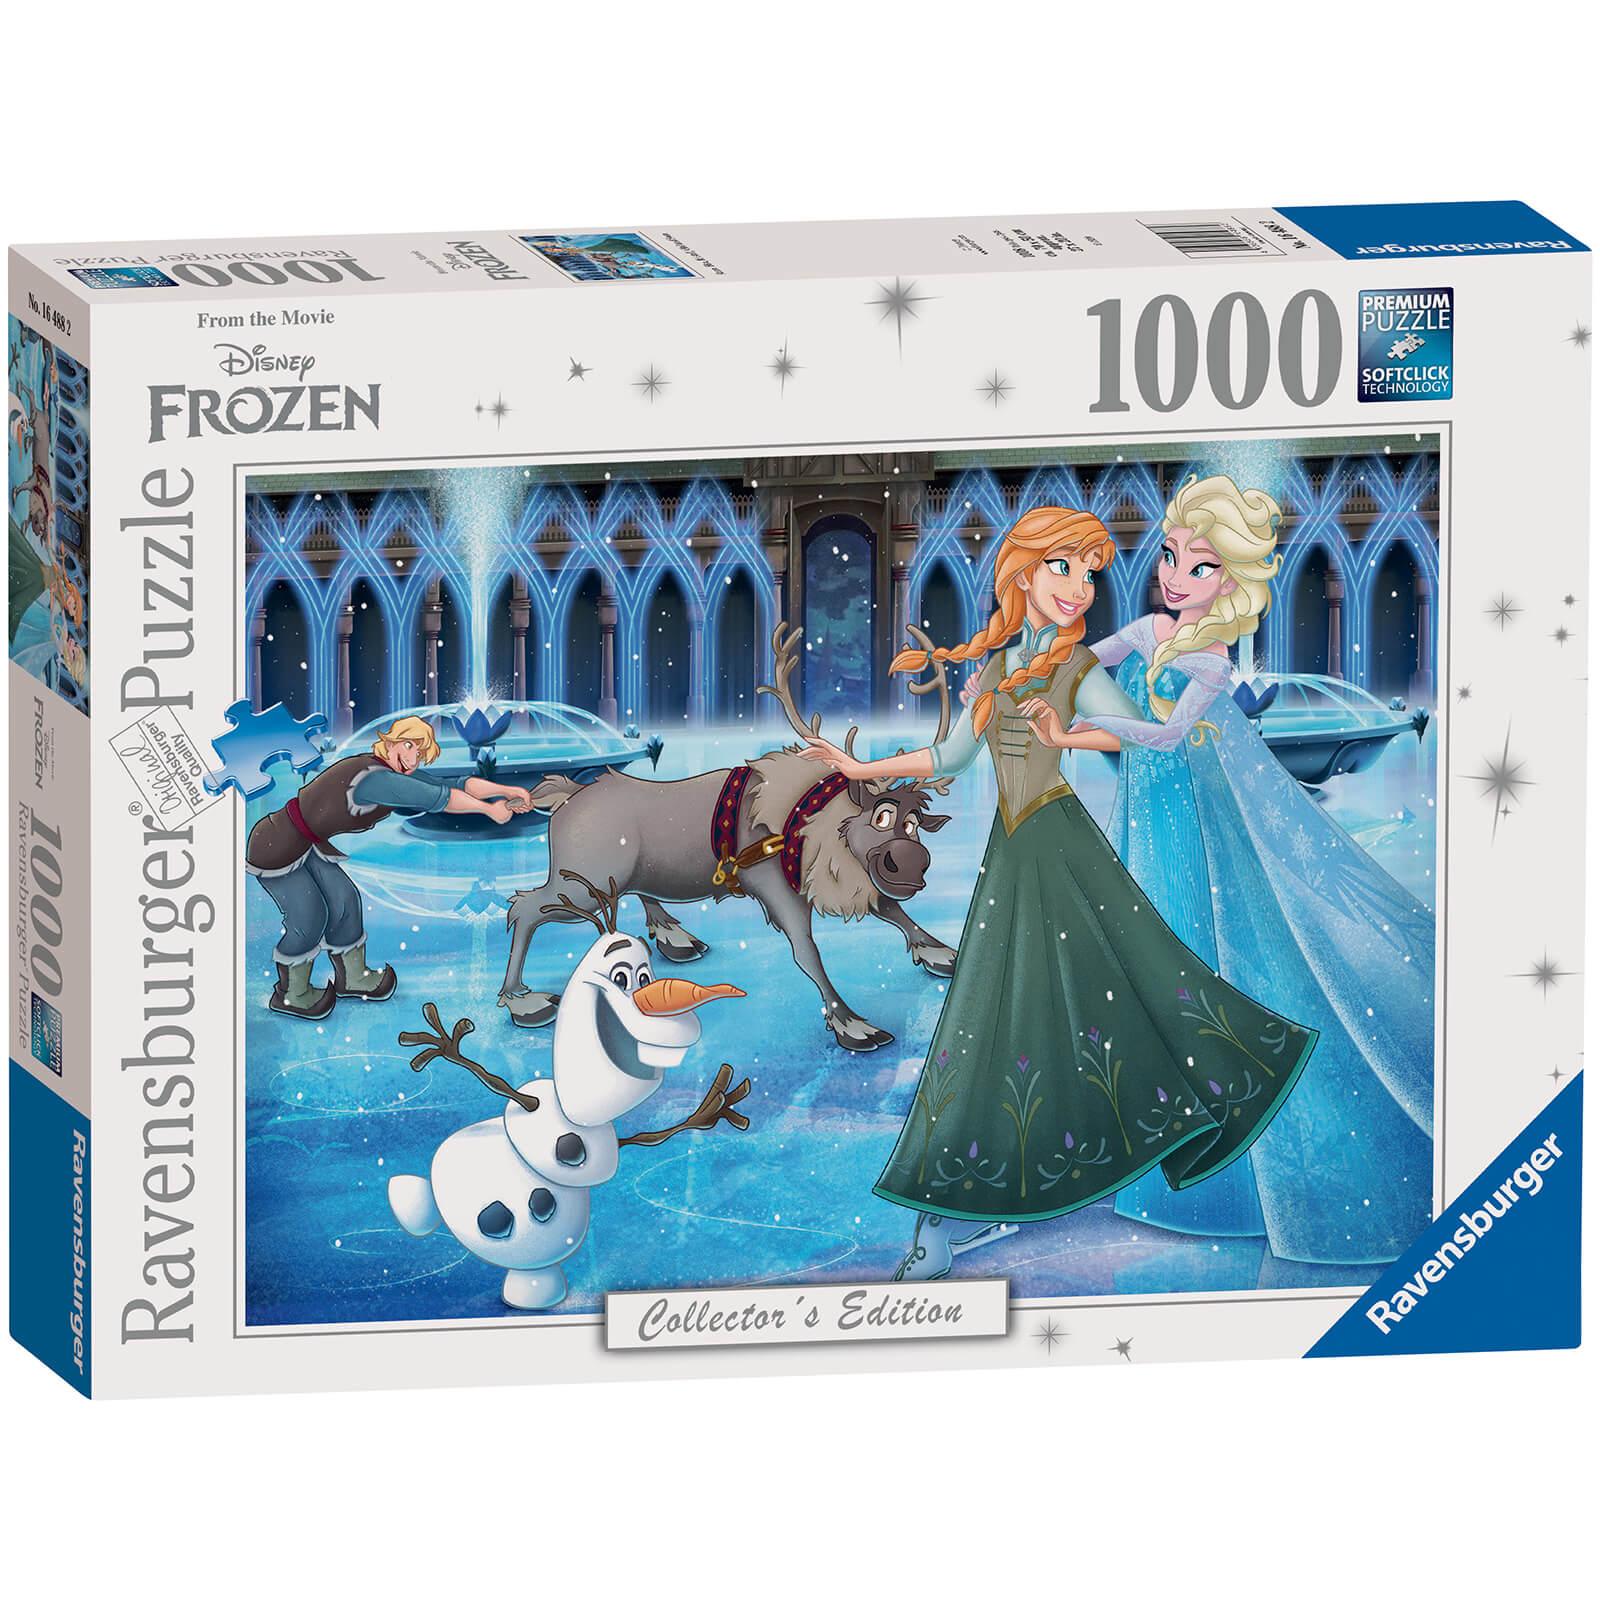 Ravensbuger Disney Collector's Edition – Frozen Puzzle (1000 Pieces)